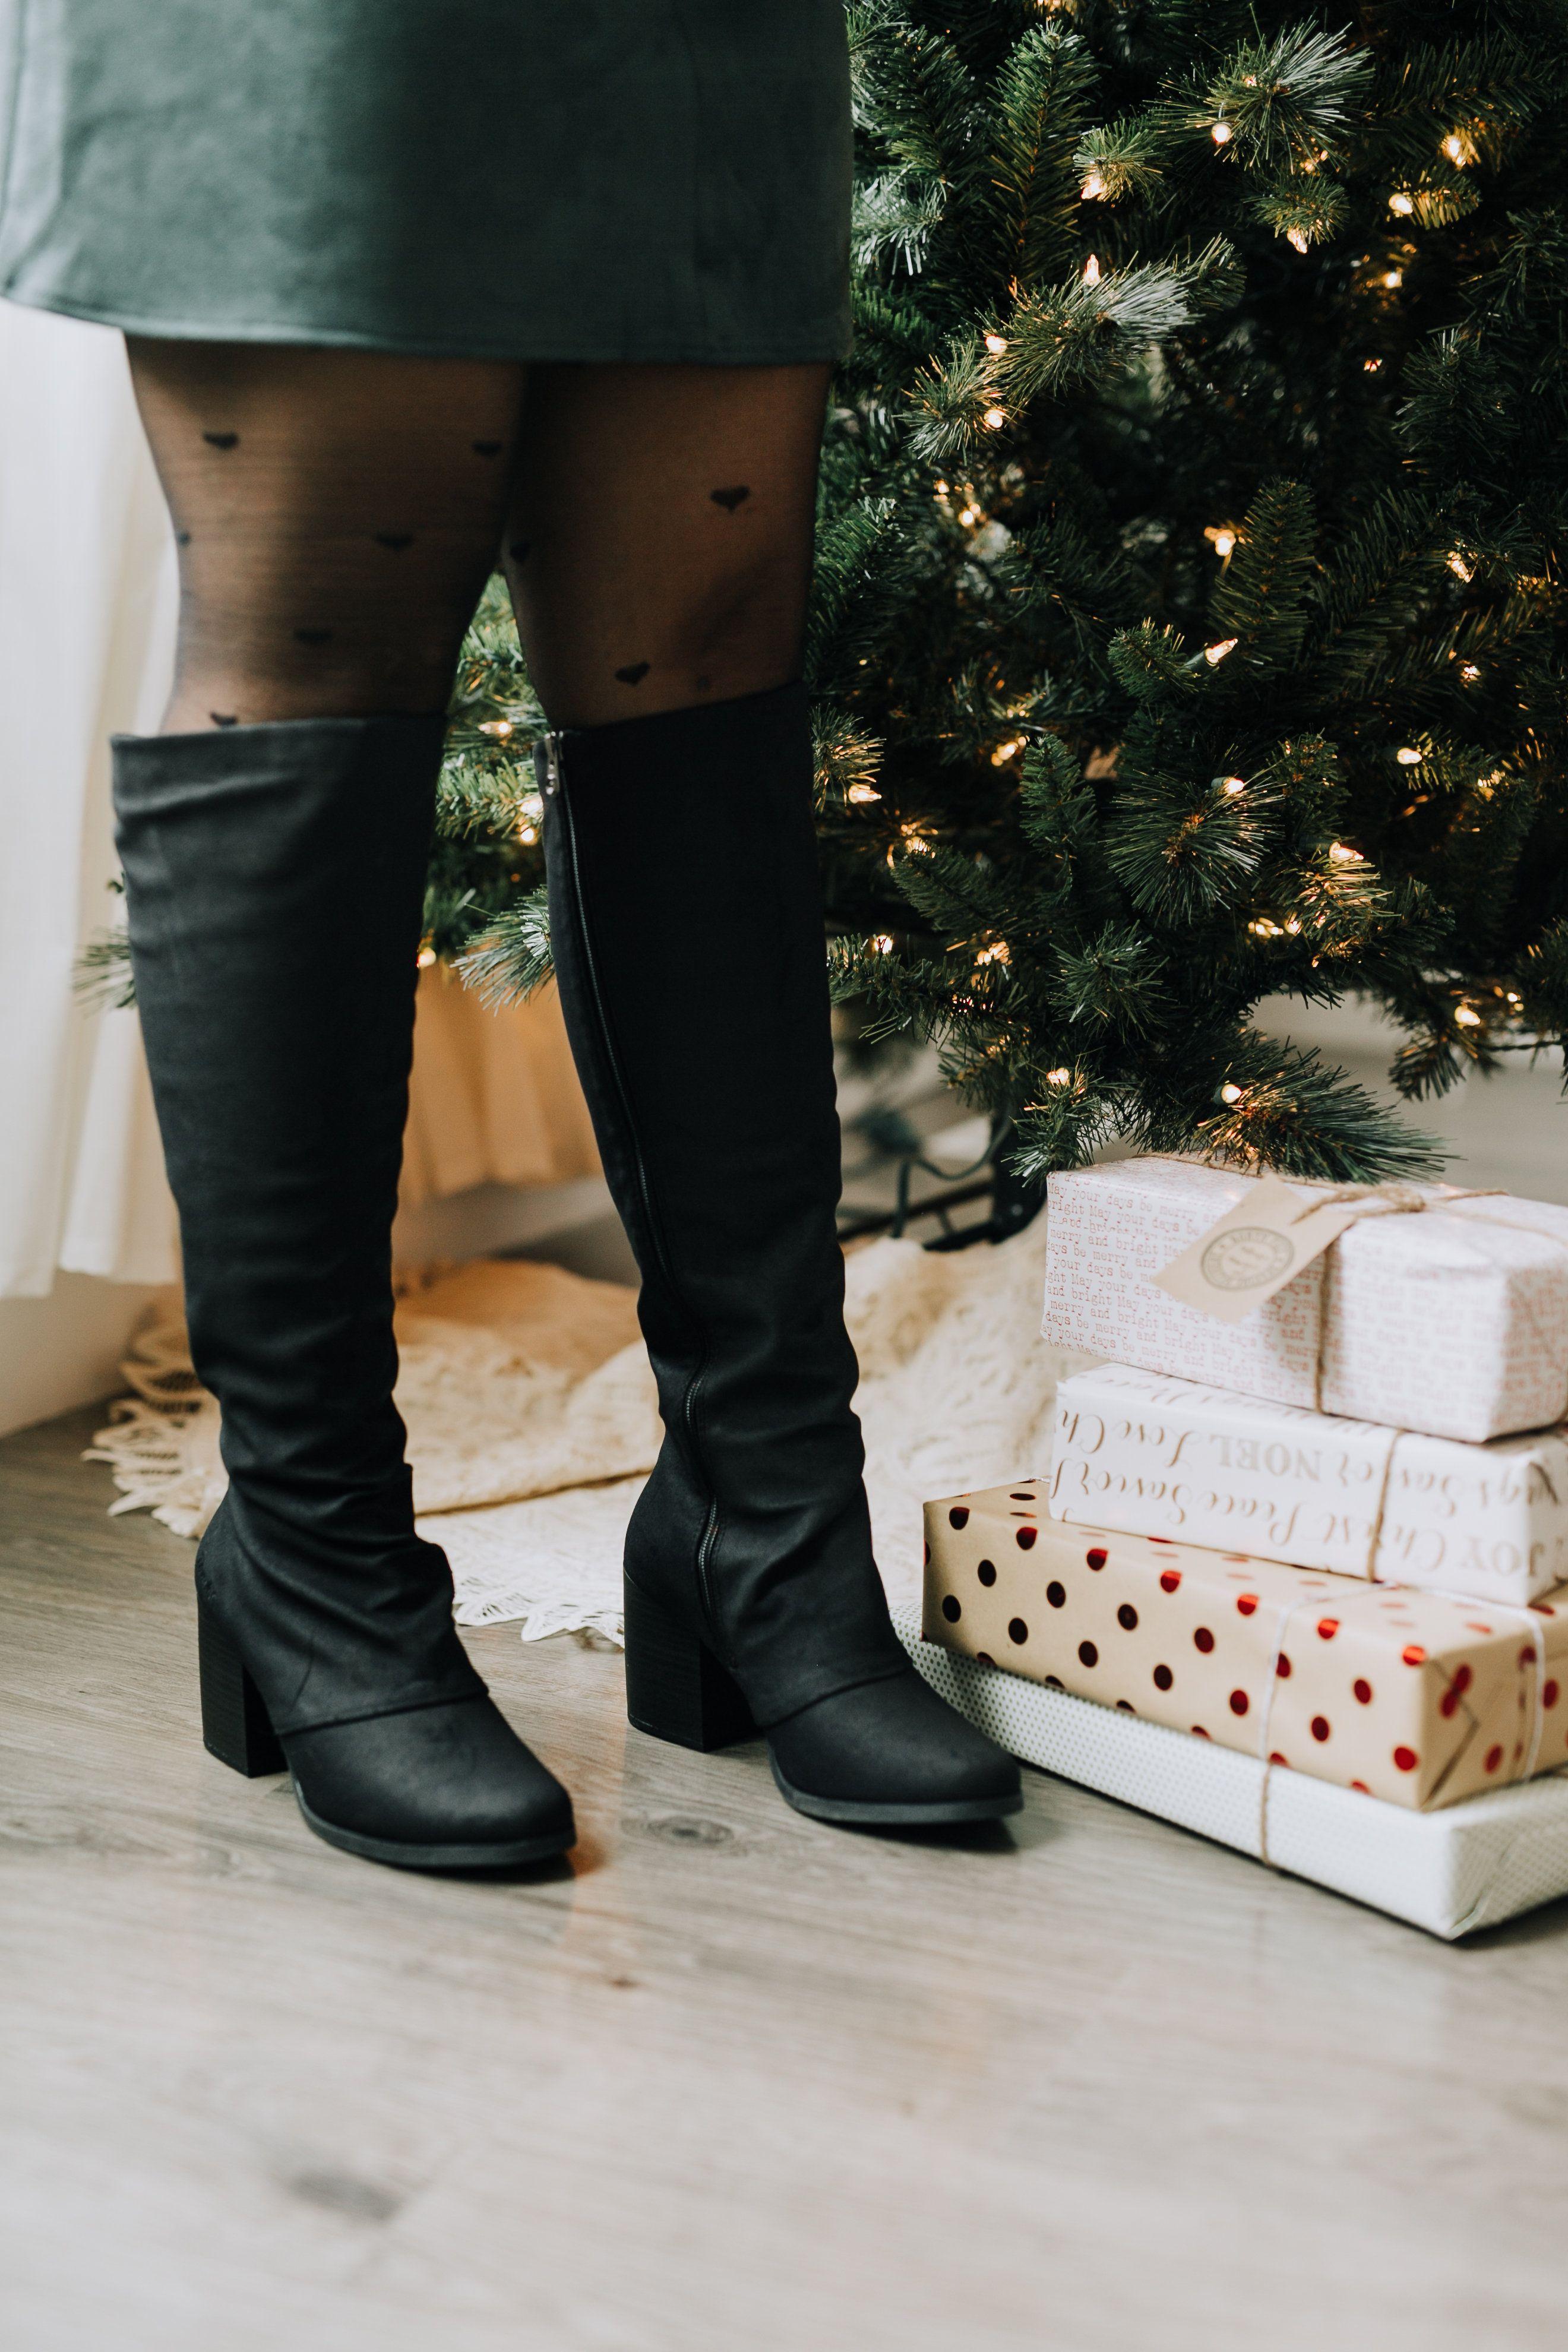 Dundee Knee High Womens Boots With Block Heel Blowfish Malibu Boots Black Boots Tall Blowfish [ 3960 x 2640 Pixel ]